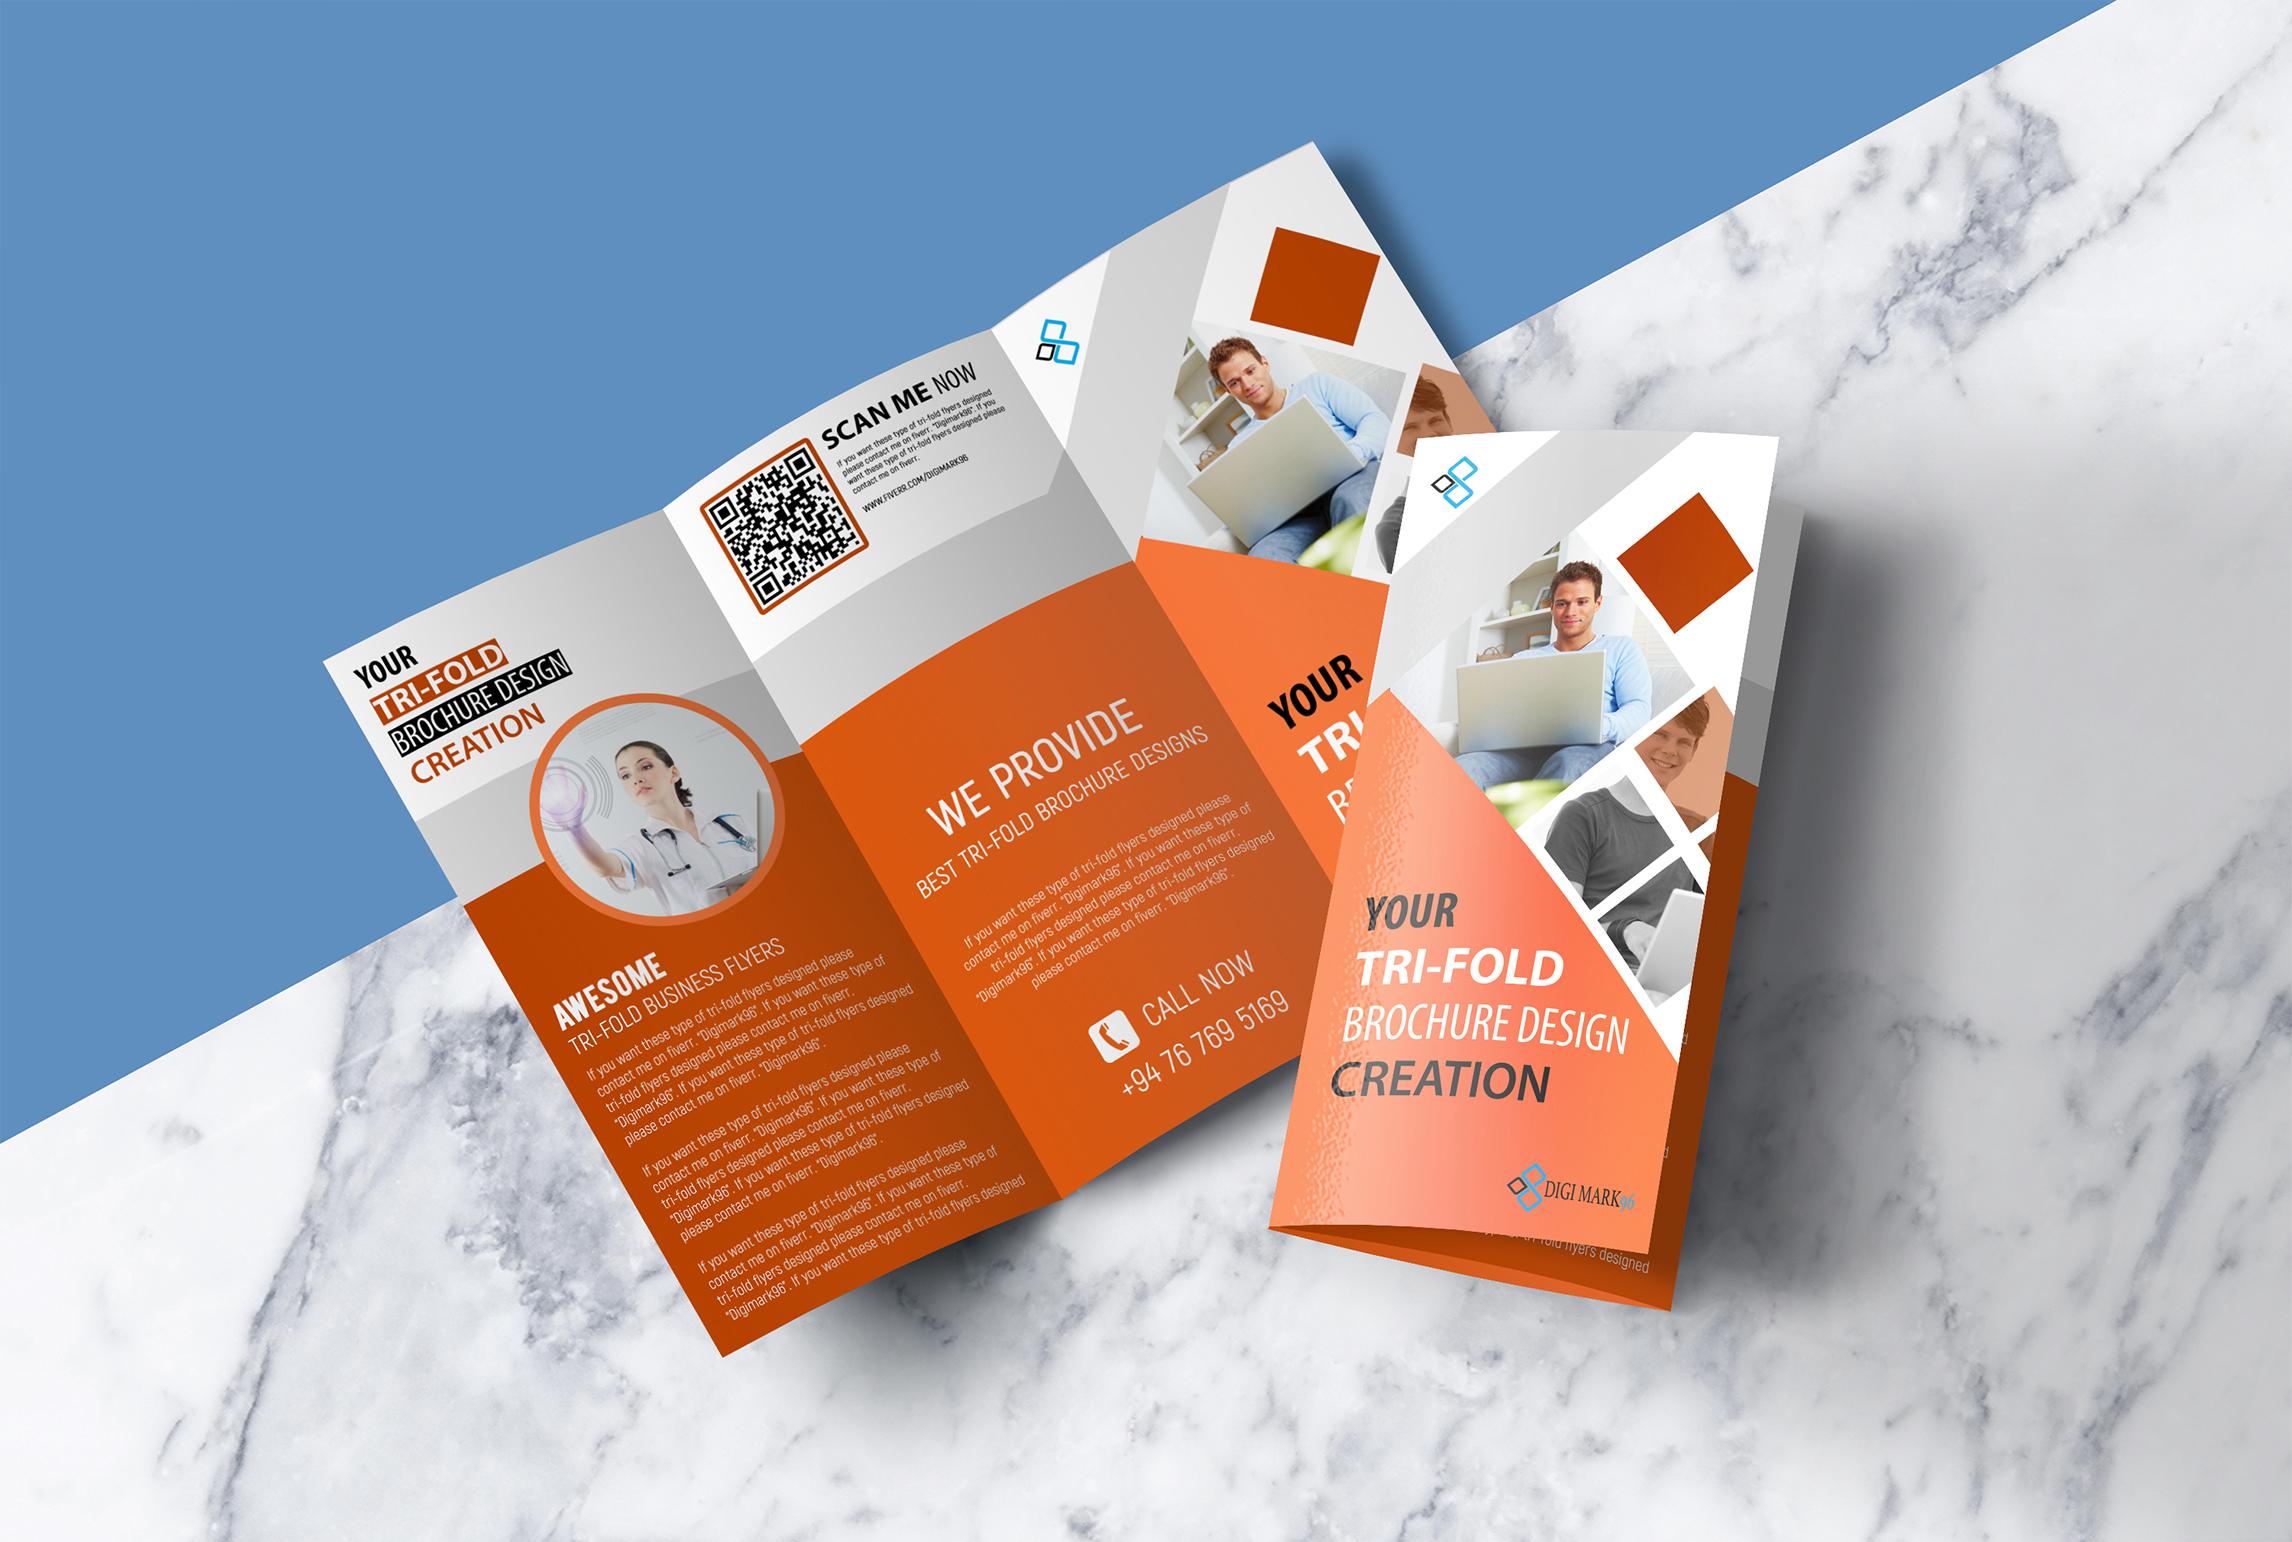 fold flyers a4 central fold flyers leaflets printing olaprint next